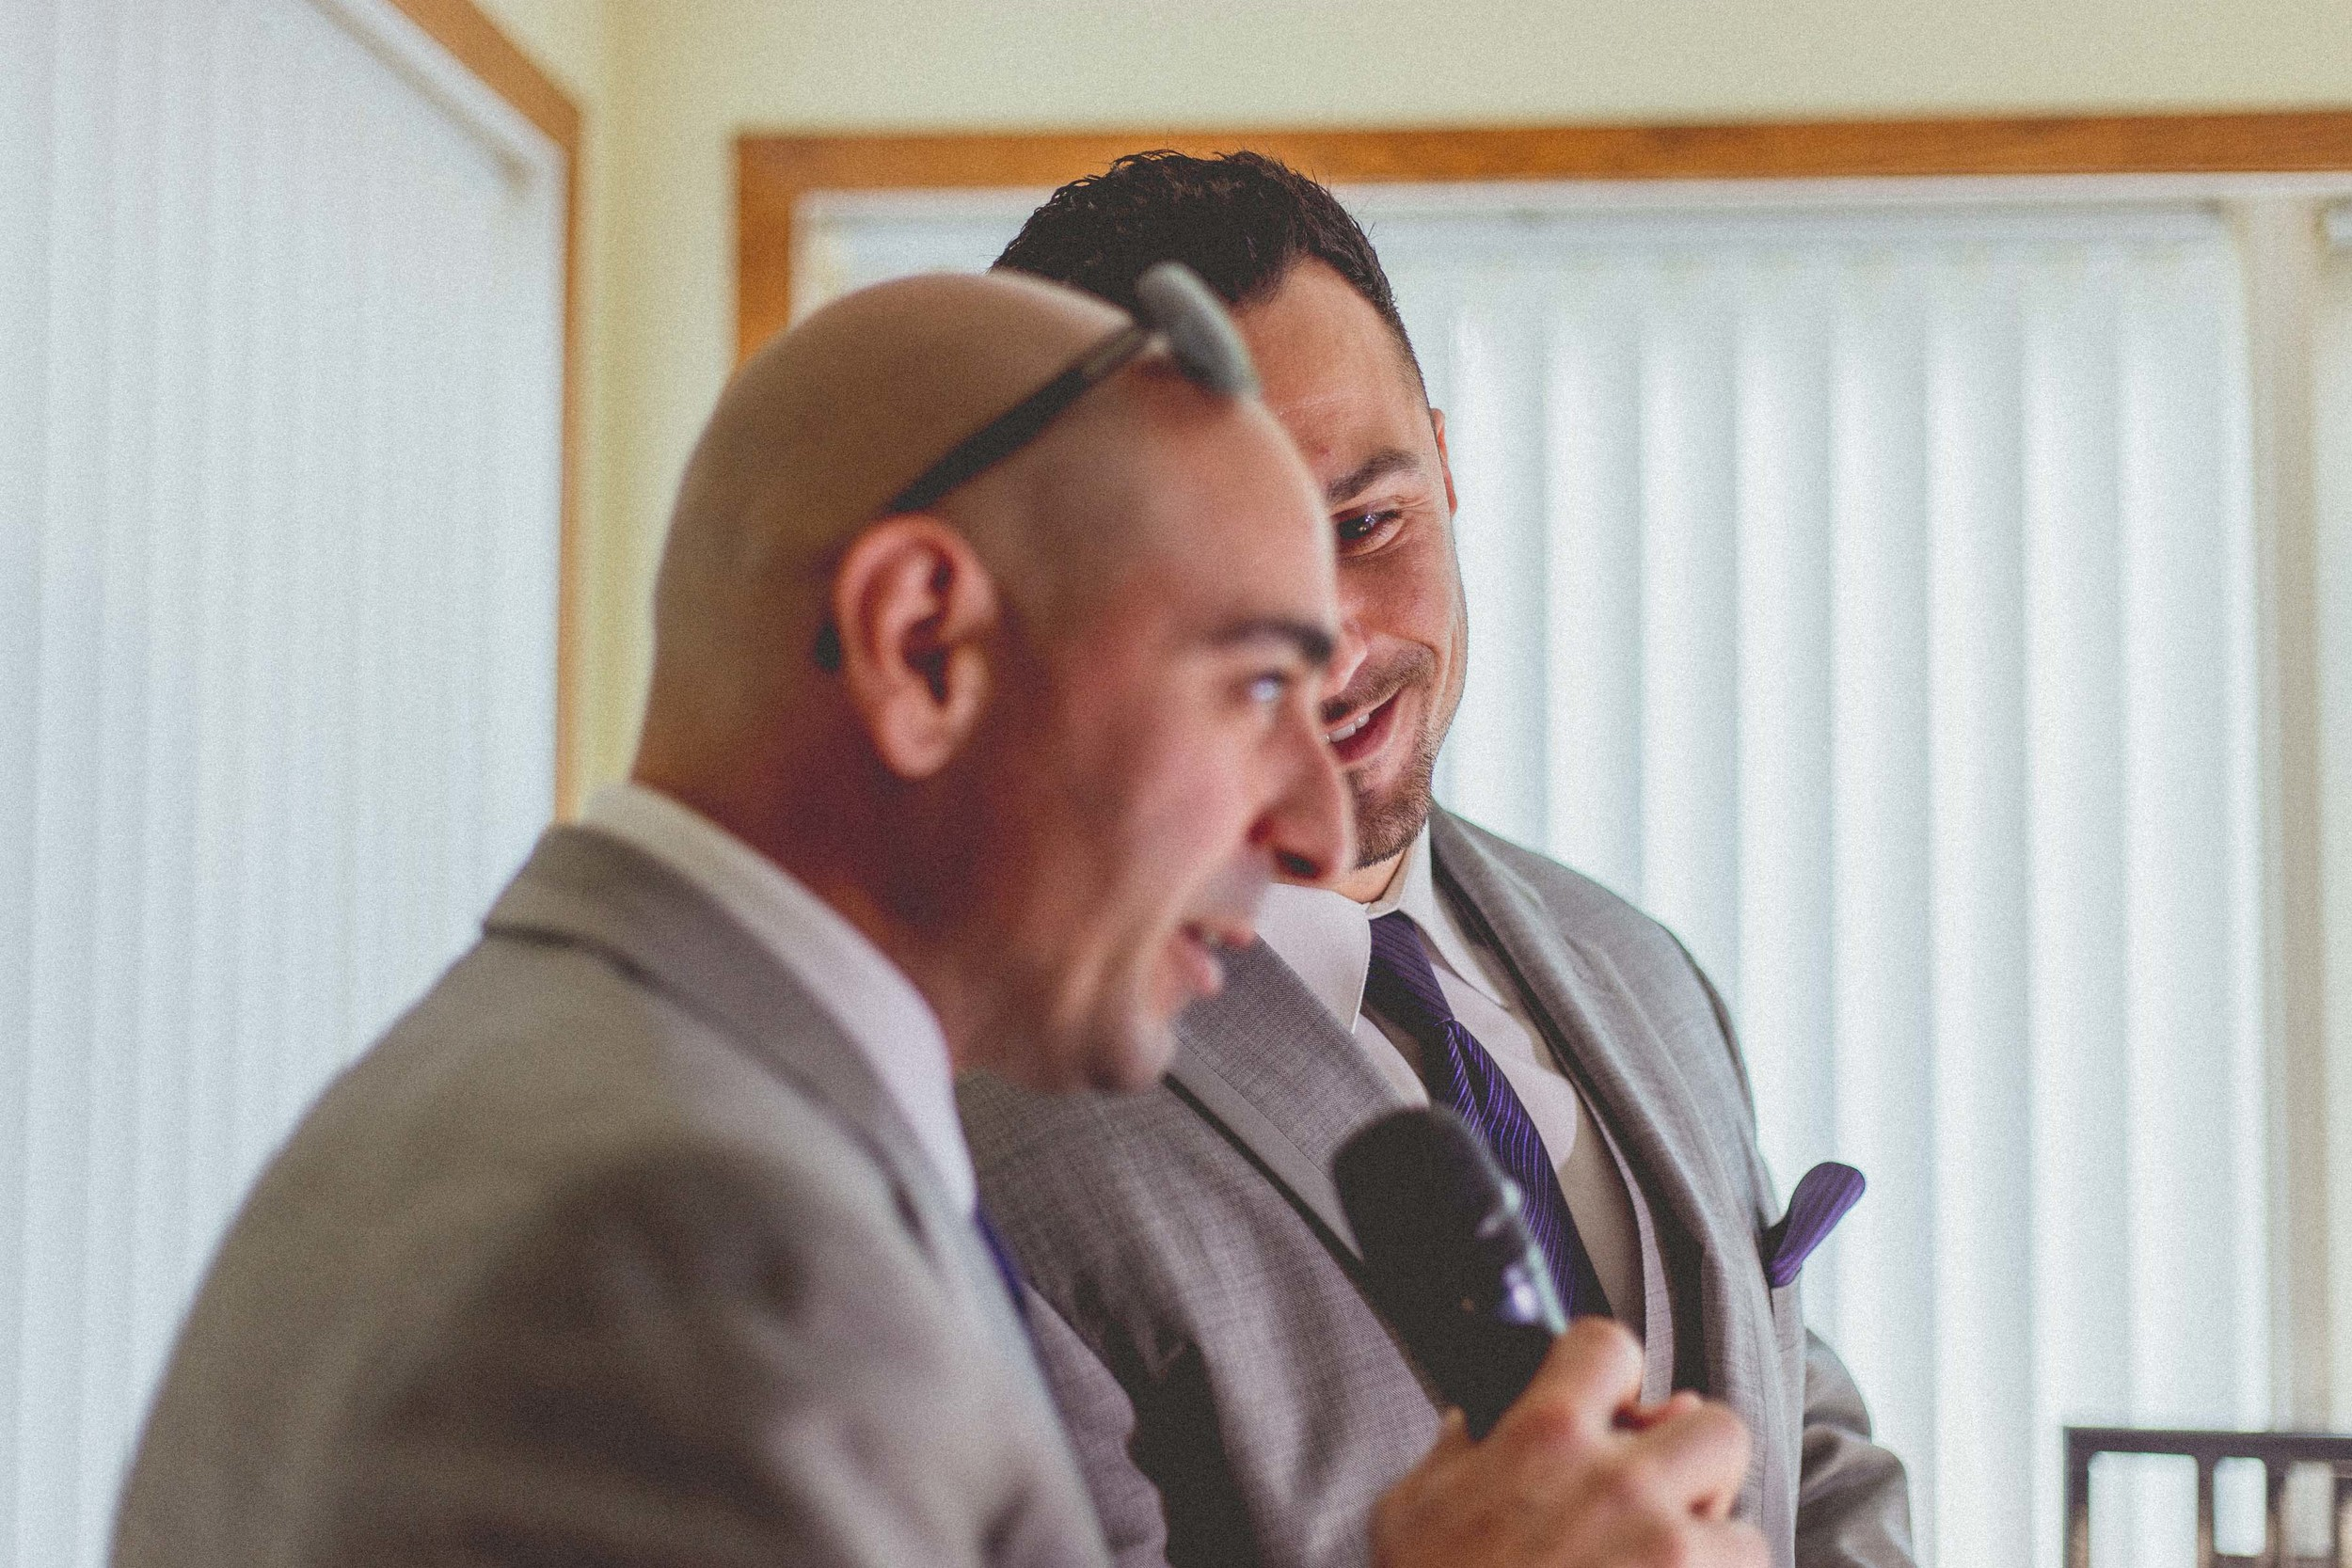 Toronto Wedding Photography | Caterina & Elvis, Pickering catholic wedding (7 of 39).jpg